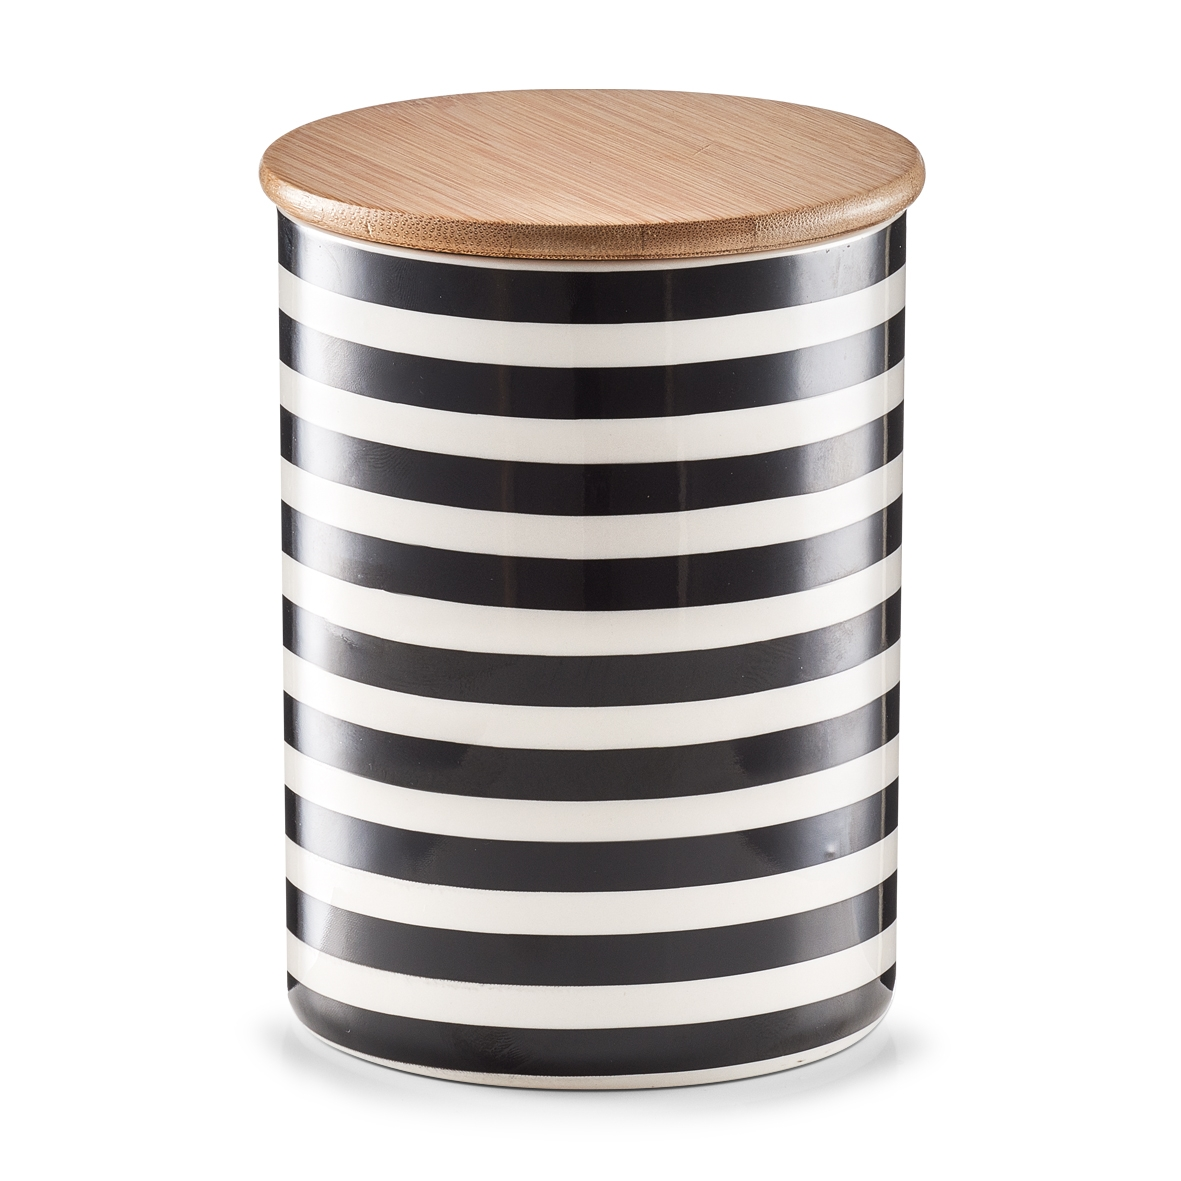 Recipient ceramic pentru depozitare Stripes, capac din bambus, Black/White, 900 ml, Ø 11,5xH15 cm imagine